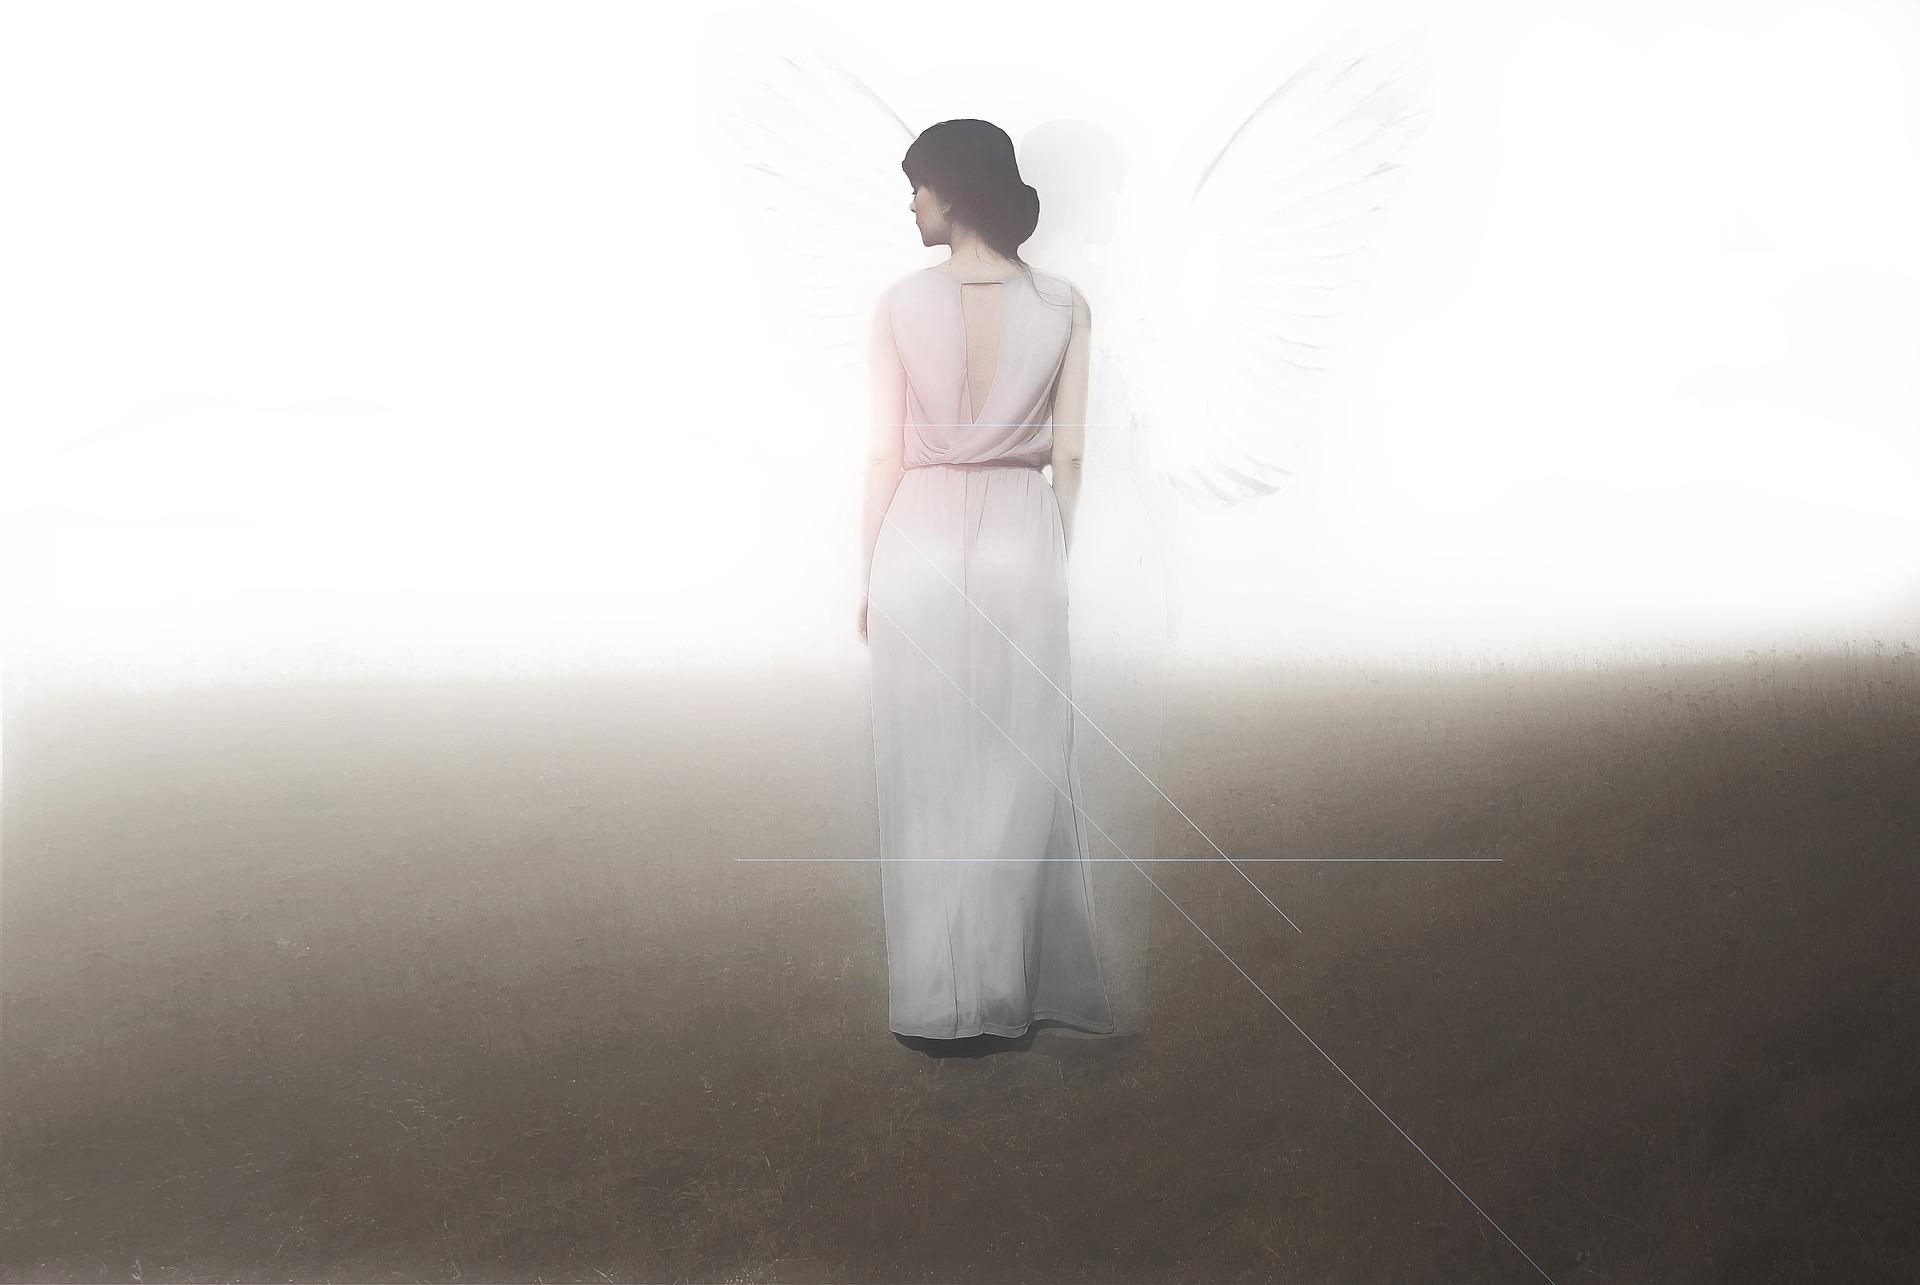 angel-2244692_1920